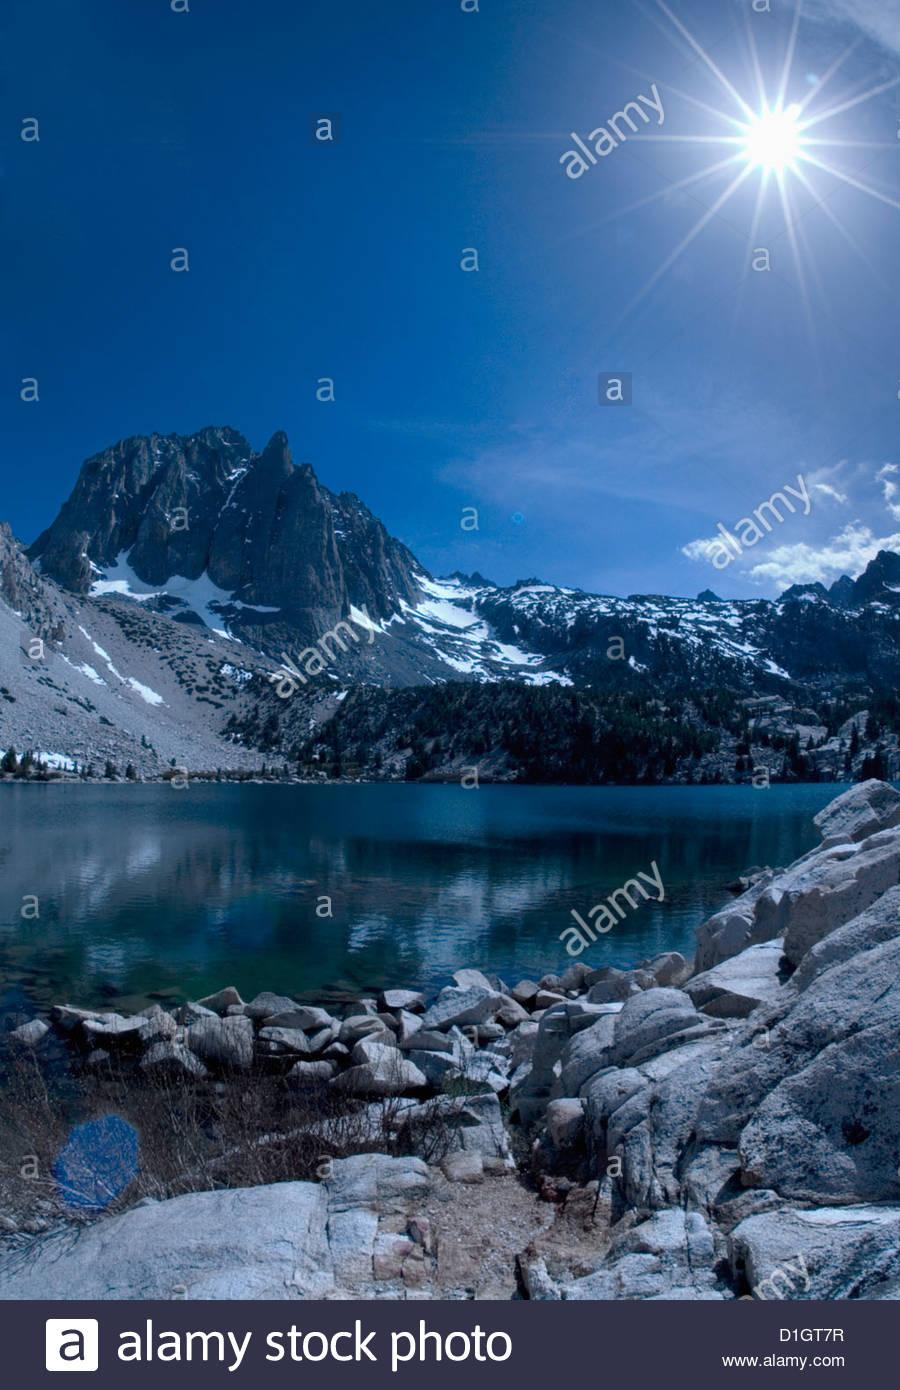 Sun shining over the mountains, Sierra Nevada, California, United States of America, North America - Stock Image